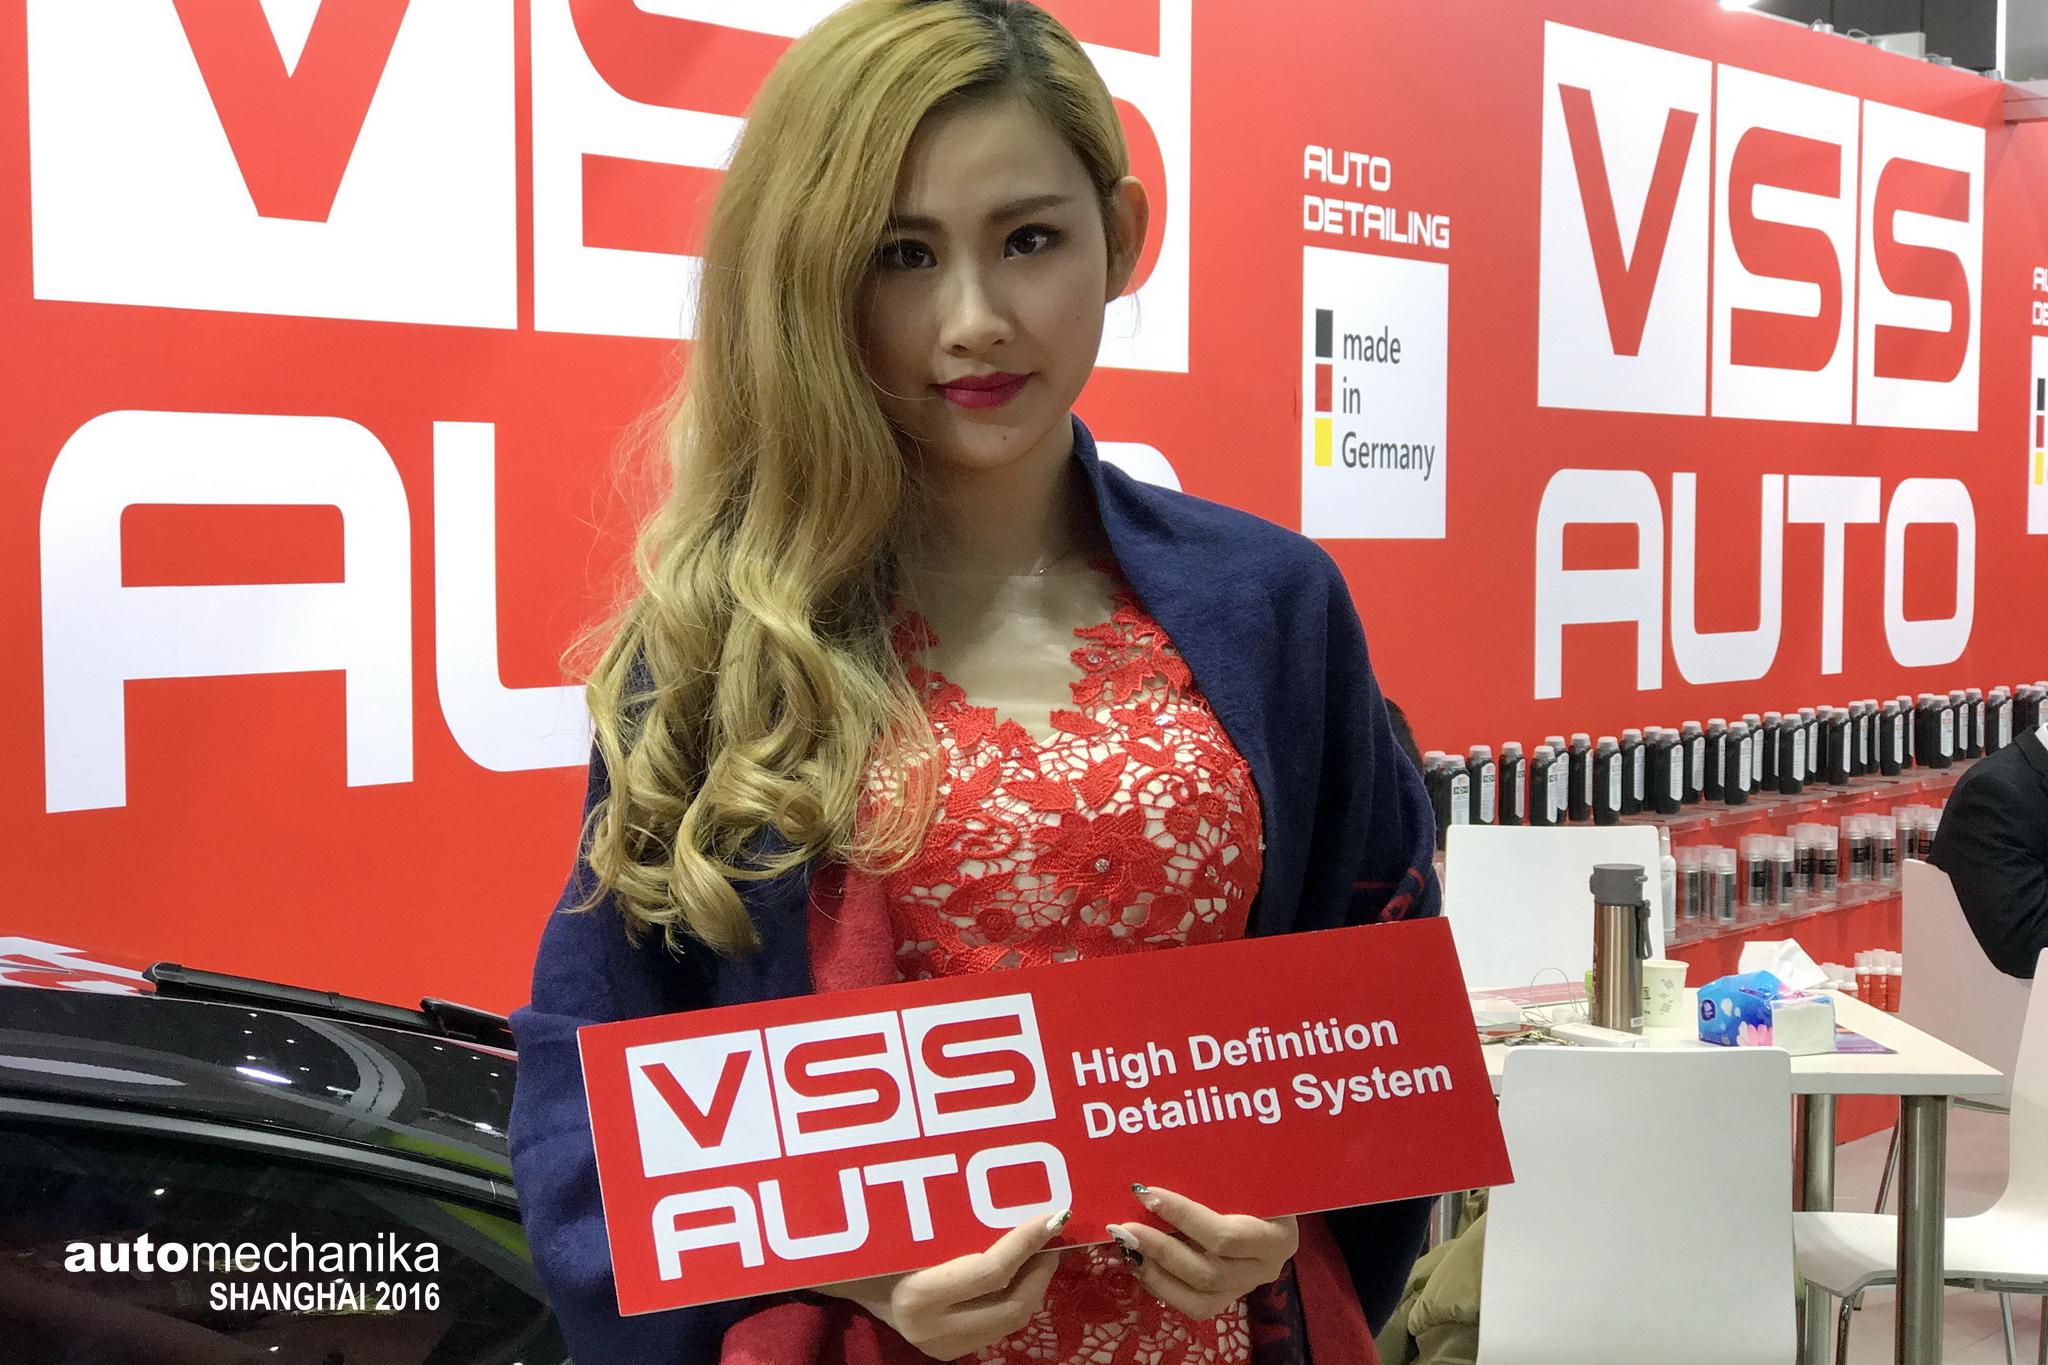 vss-auto-automechanika-shanghai-19